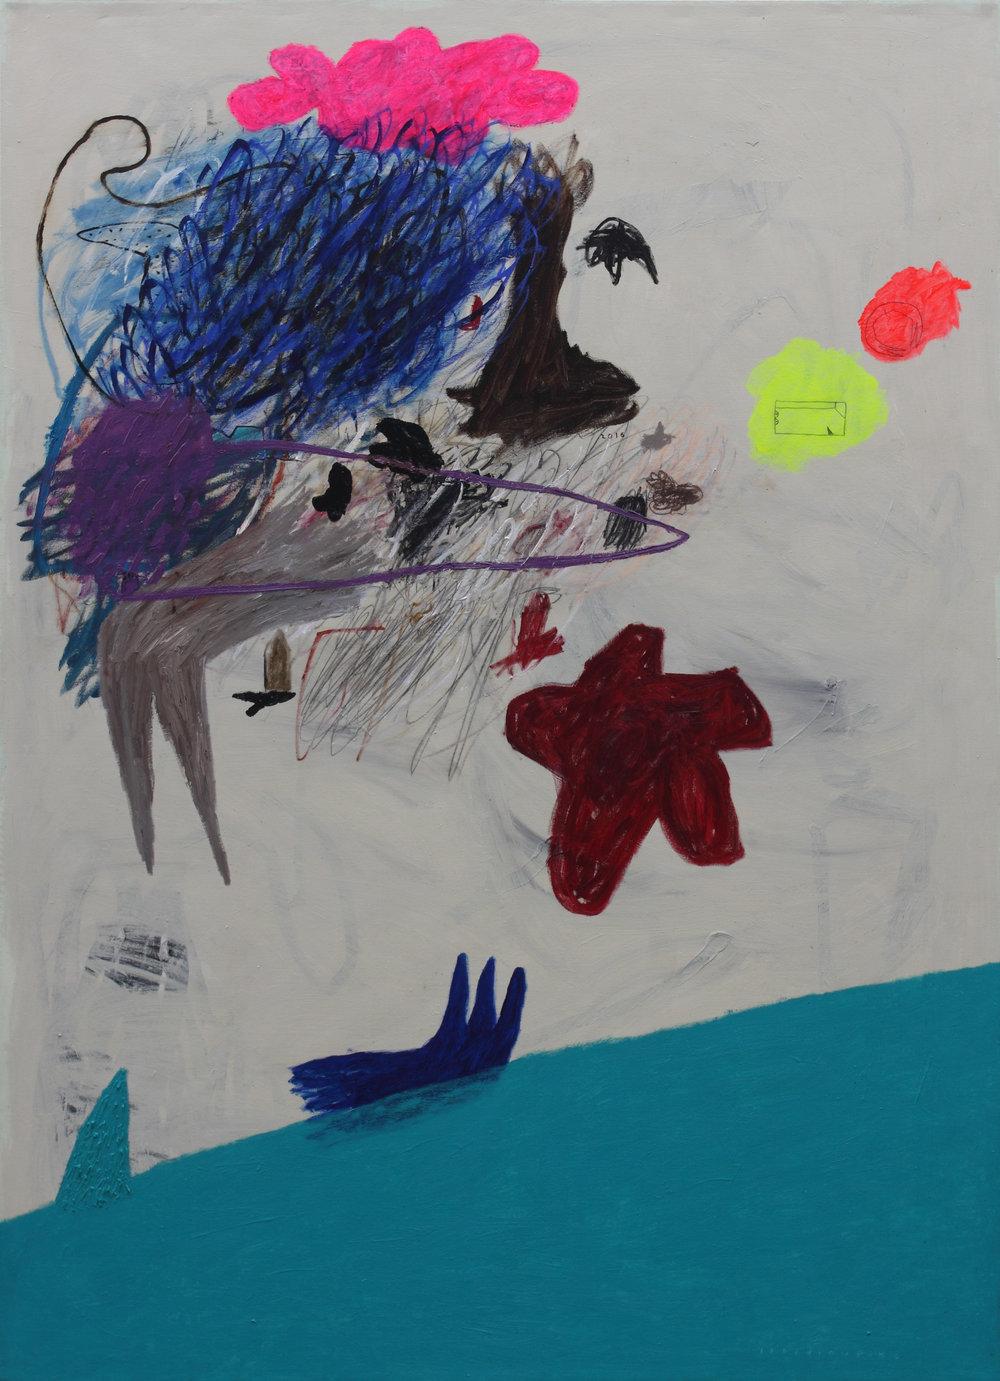 Iabadiou Piko, b.1984 (INDONESIA)  Title: Menumpuk Di Atas Hamparan, Mencoret Berisik Di Bawah Pink, Di Kejauhan Tampak Pemandangan Di Atas Laut, Sepotong Jiwa Biru Perlahan Tenggelam  Medium: Acrylic, Bitumen, Oil, Pastel, Charcoal Pencil on Canvas  Dimension: 200 x 145 cm  Year: 2017